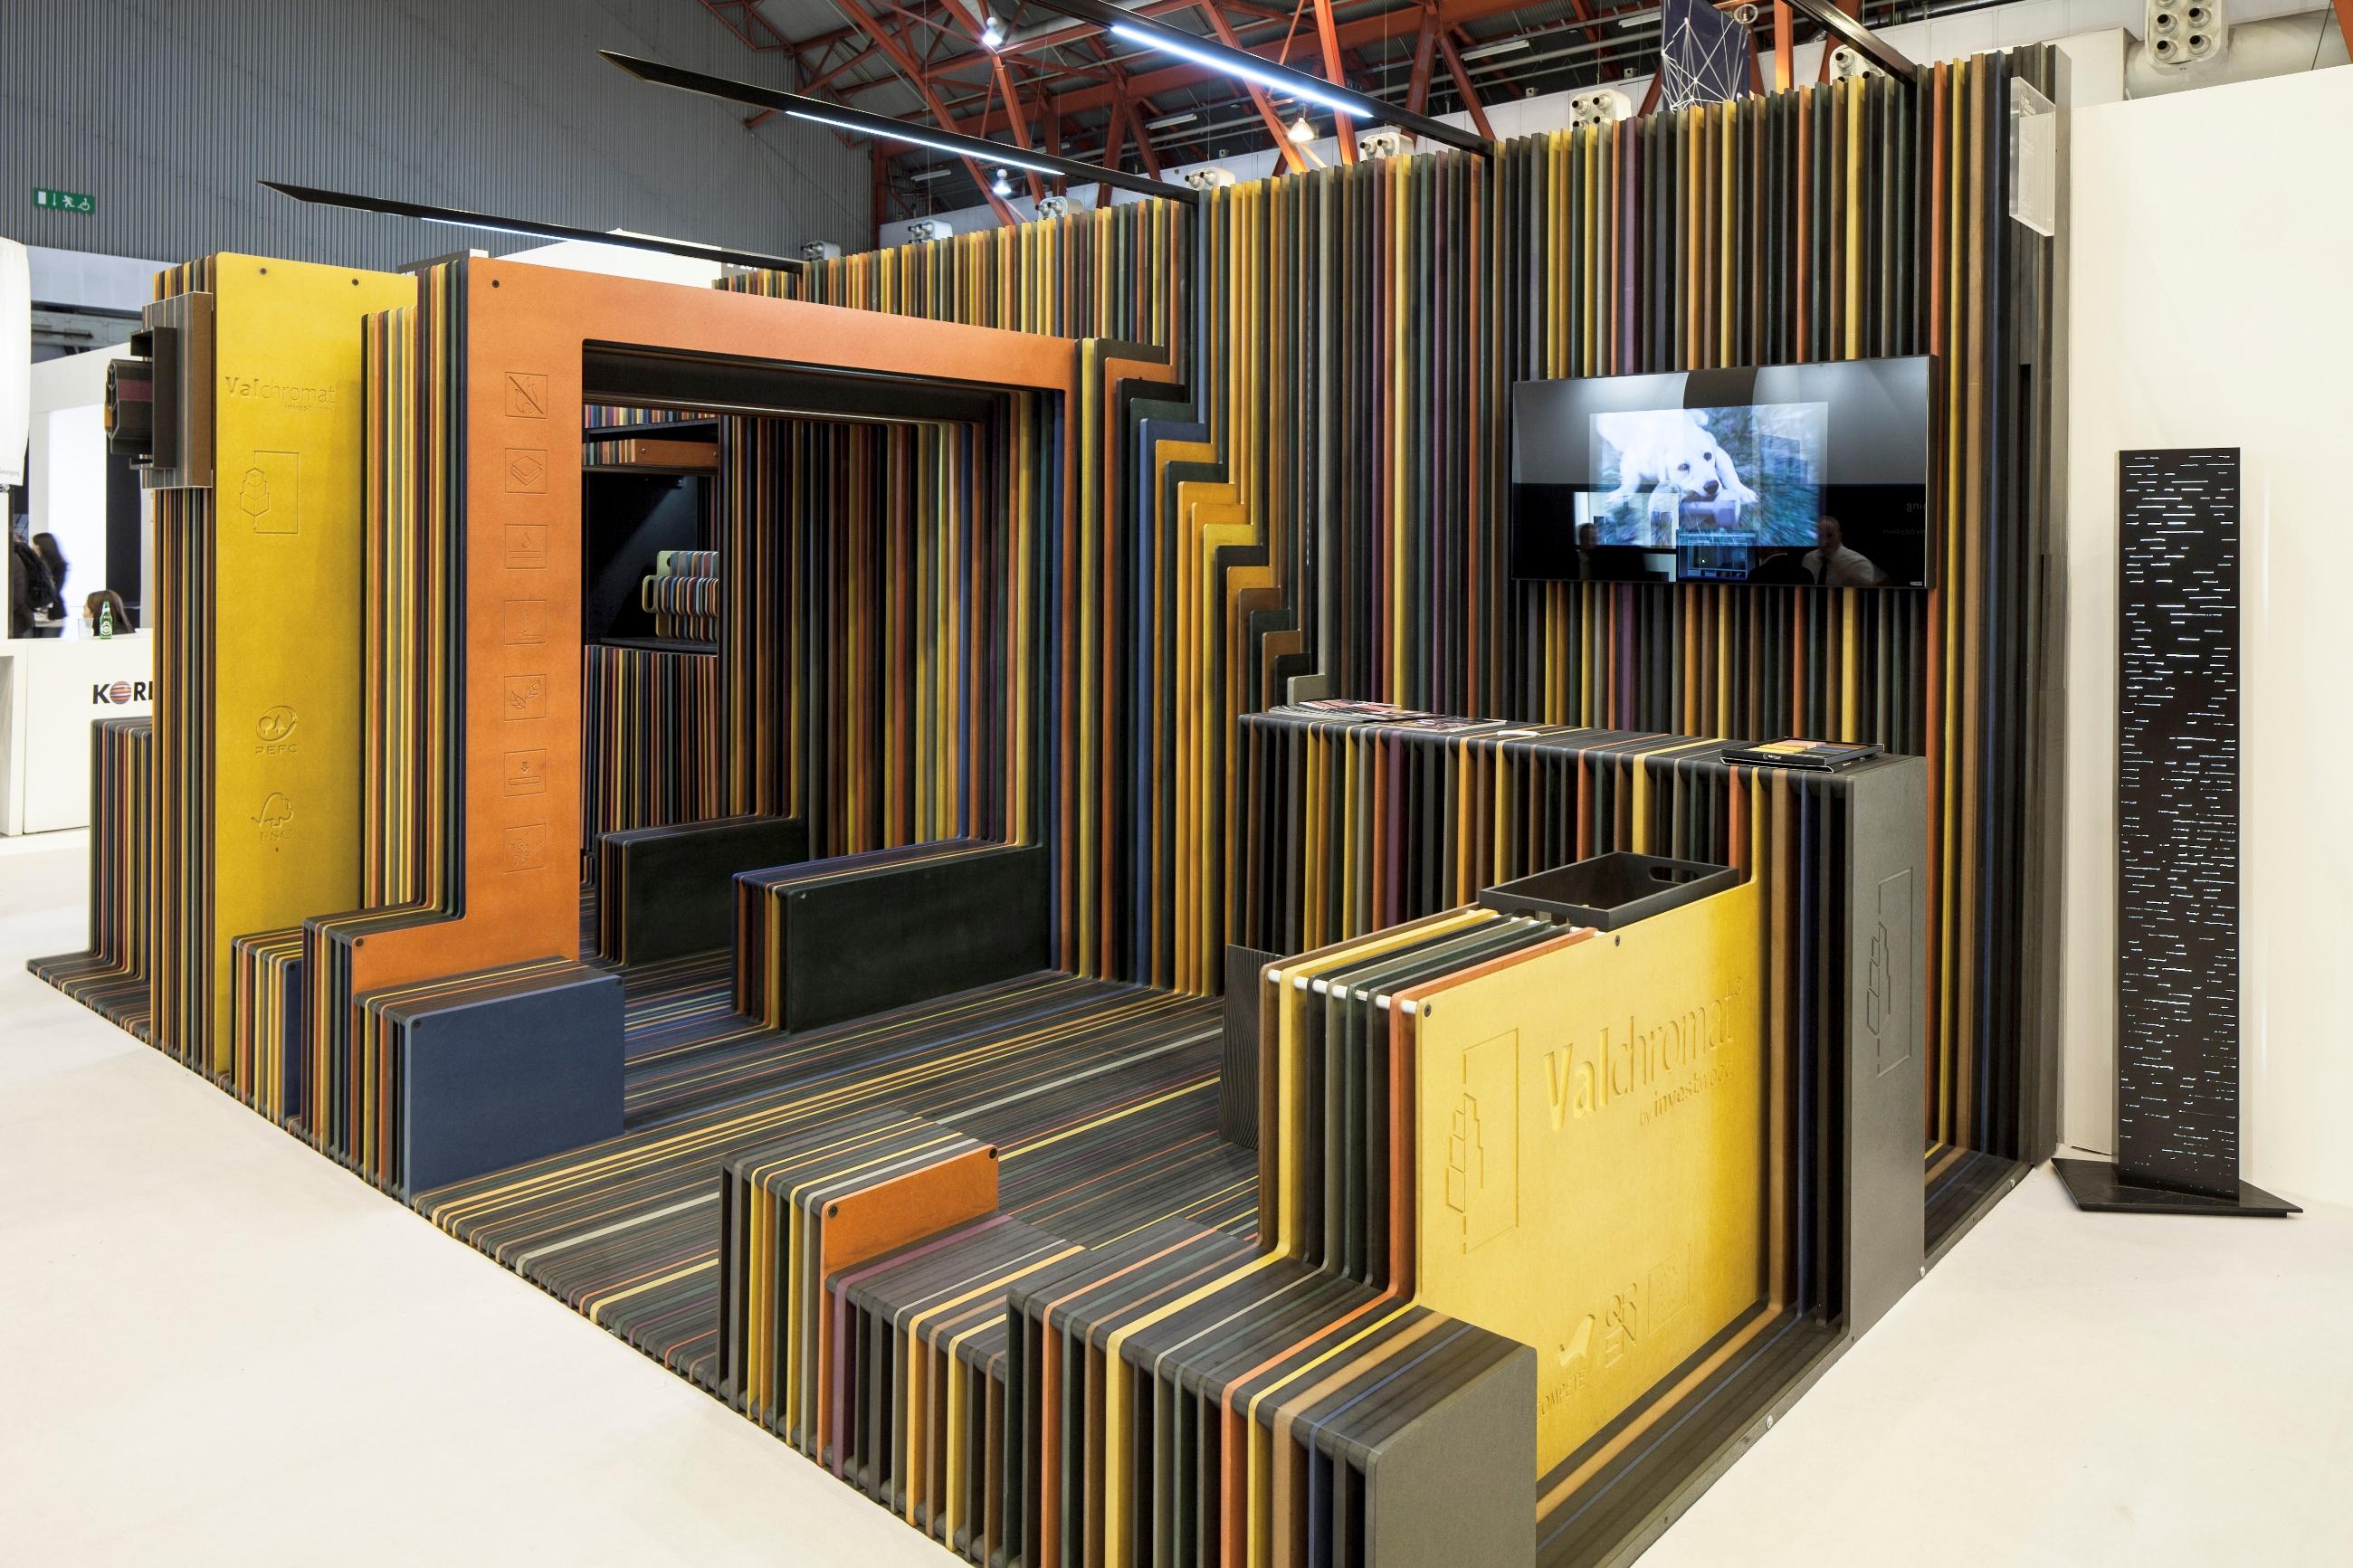 Valchromat Engineered Coloured Wood By Valchromat Archello